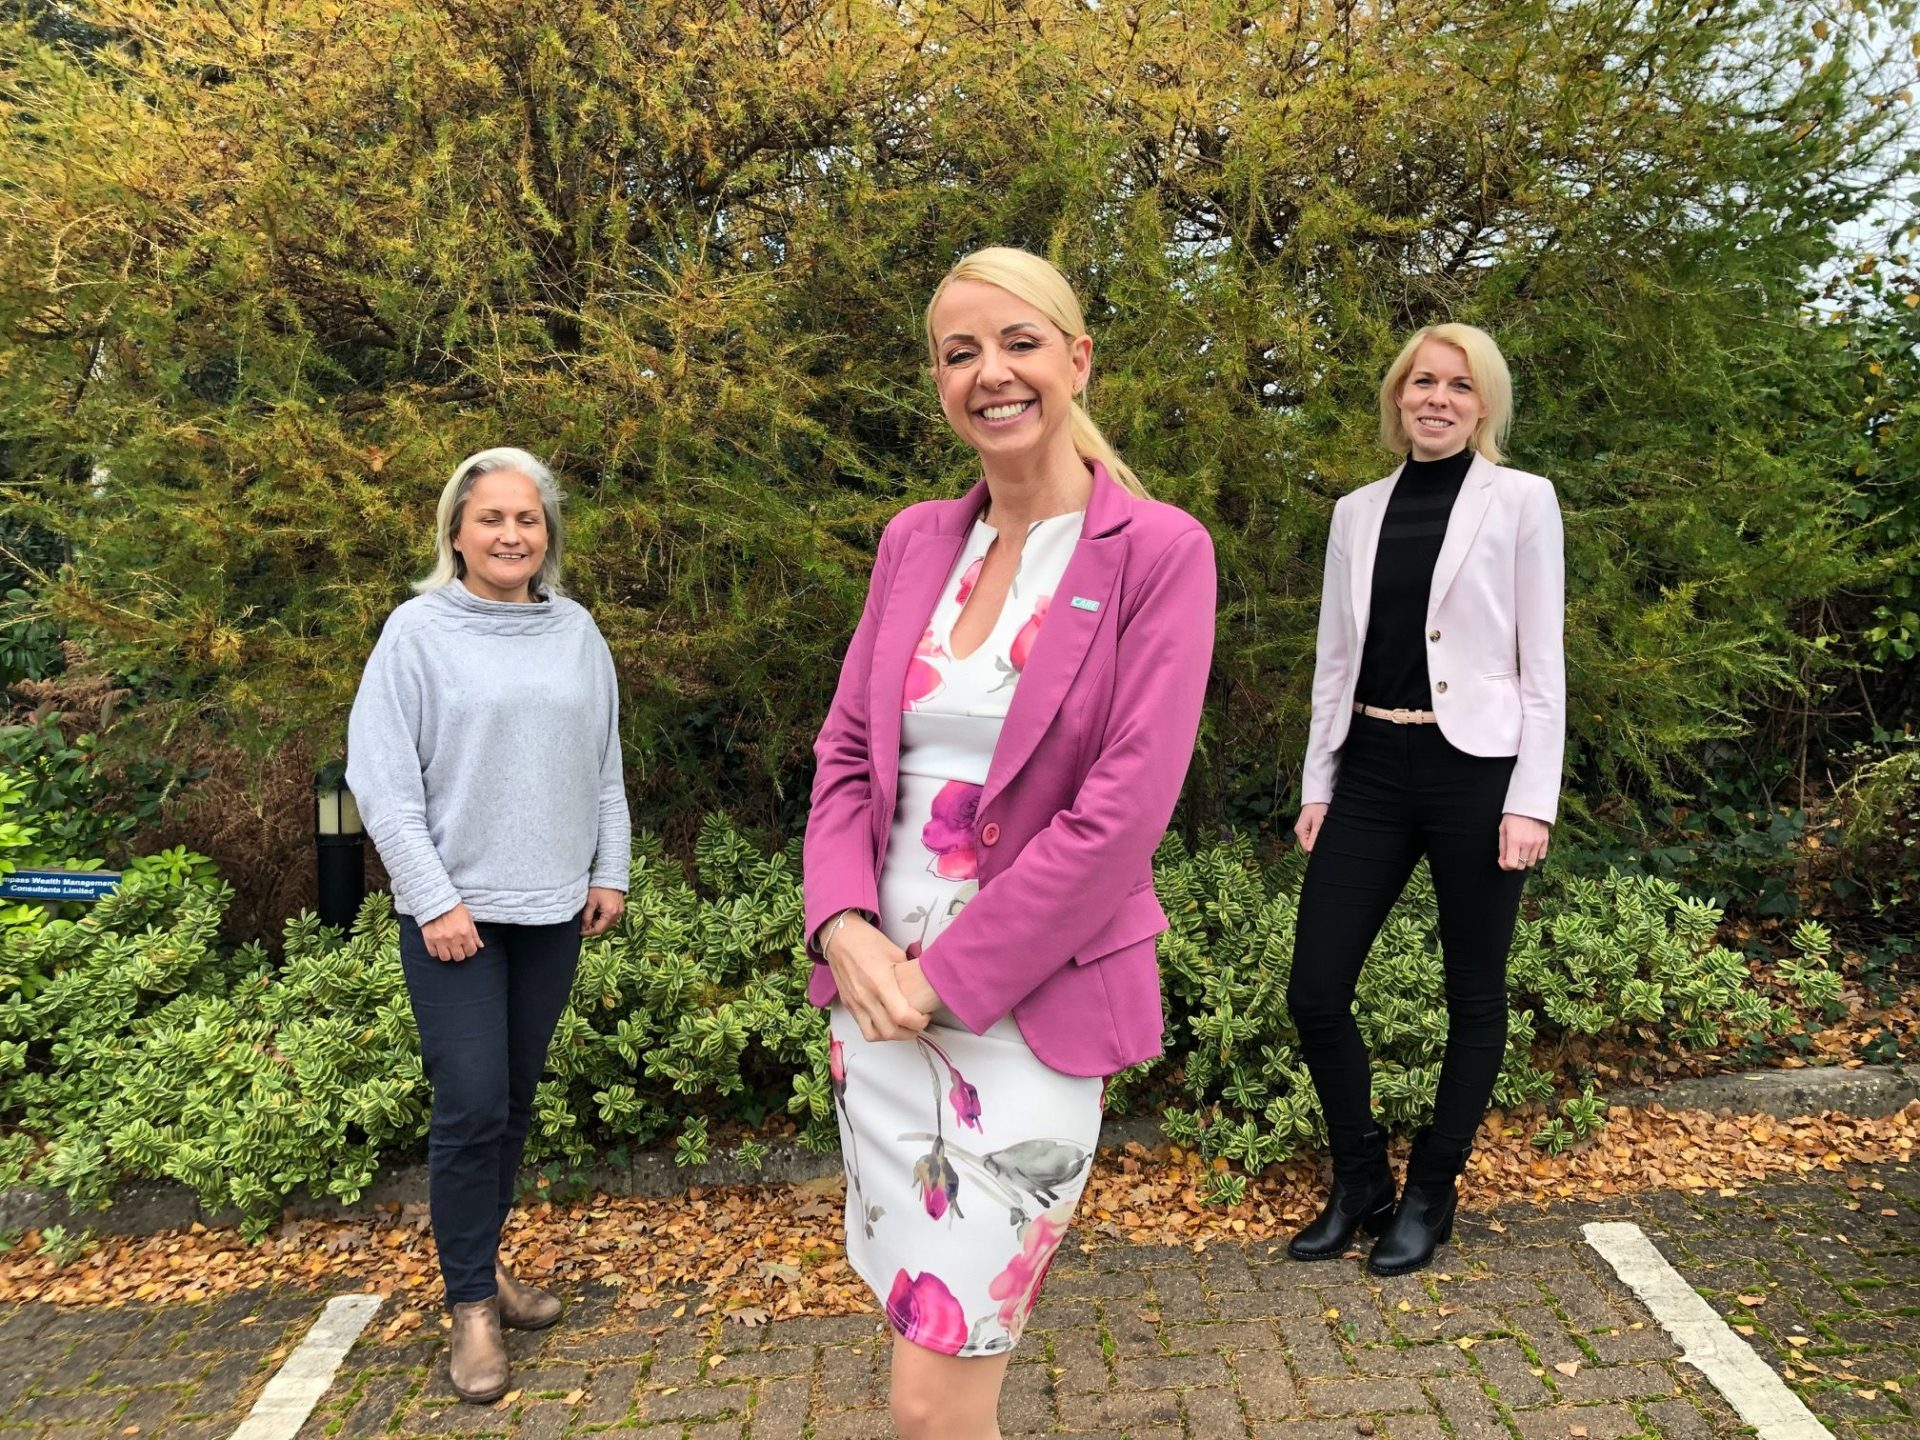 Good Oaks home Care hires three new team members – Beata Roberts, Claire Jackson, Pavlina Jordan. Credit – Good Oaks Home Care